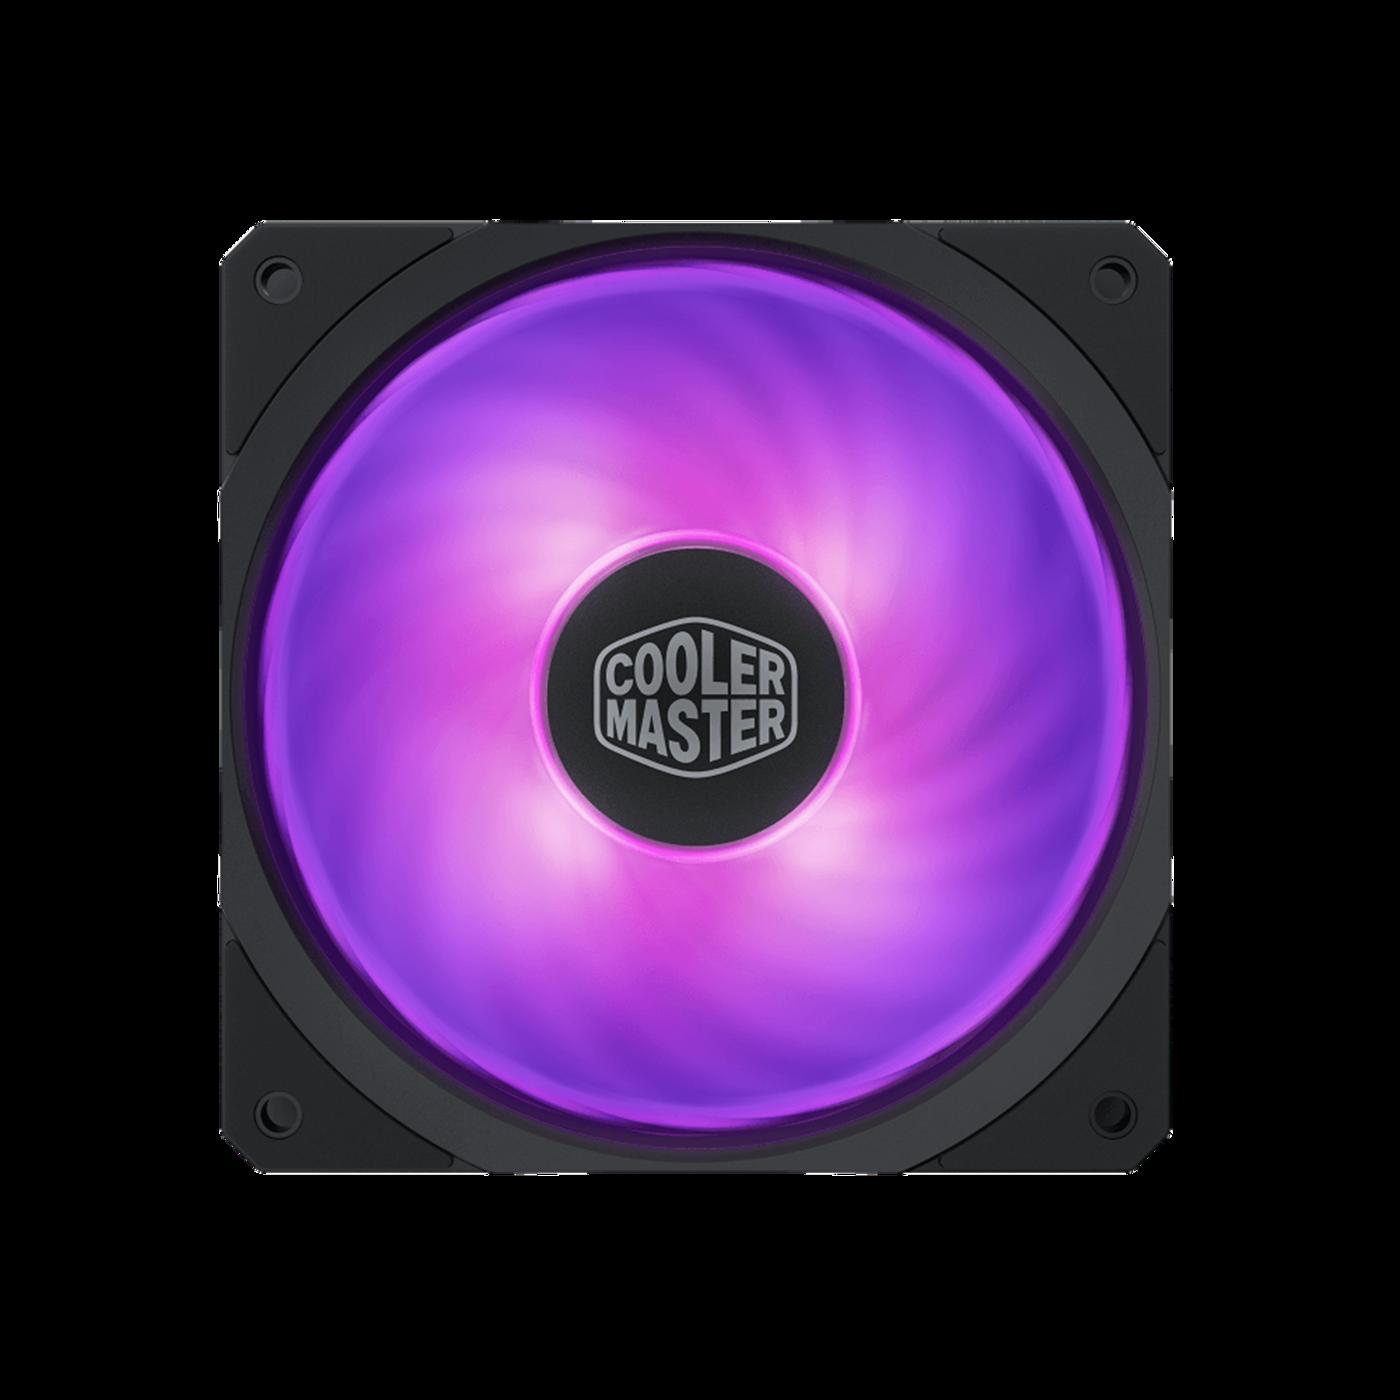 test Cooler Master MasterFan SF120R RGB, recenzja Cooler Master MasterFan SF120R RGB, review Cooler Master MasterFan SF120R RGB, opinia Cooler Master MasterFan SF120R RGB, czy warto Cooler Master MasterFan SF120R RGB, cena Cooler Master MasterFan SF120R RGB, wydajność Cooler Master MasterFan SF120R RGB, świecenie Cooler Master MasterFan SF120R RGB, LED Cooler Master MasterFan SF120R RGB, testy Cooler Master MasterFan SF120R RGB